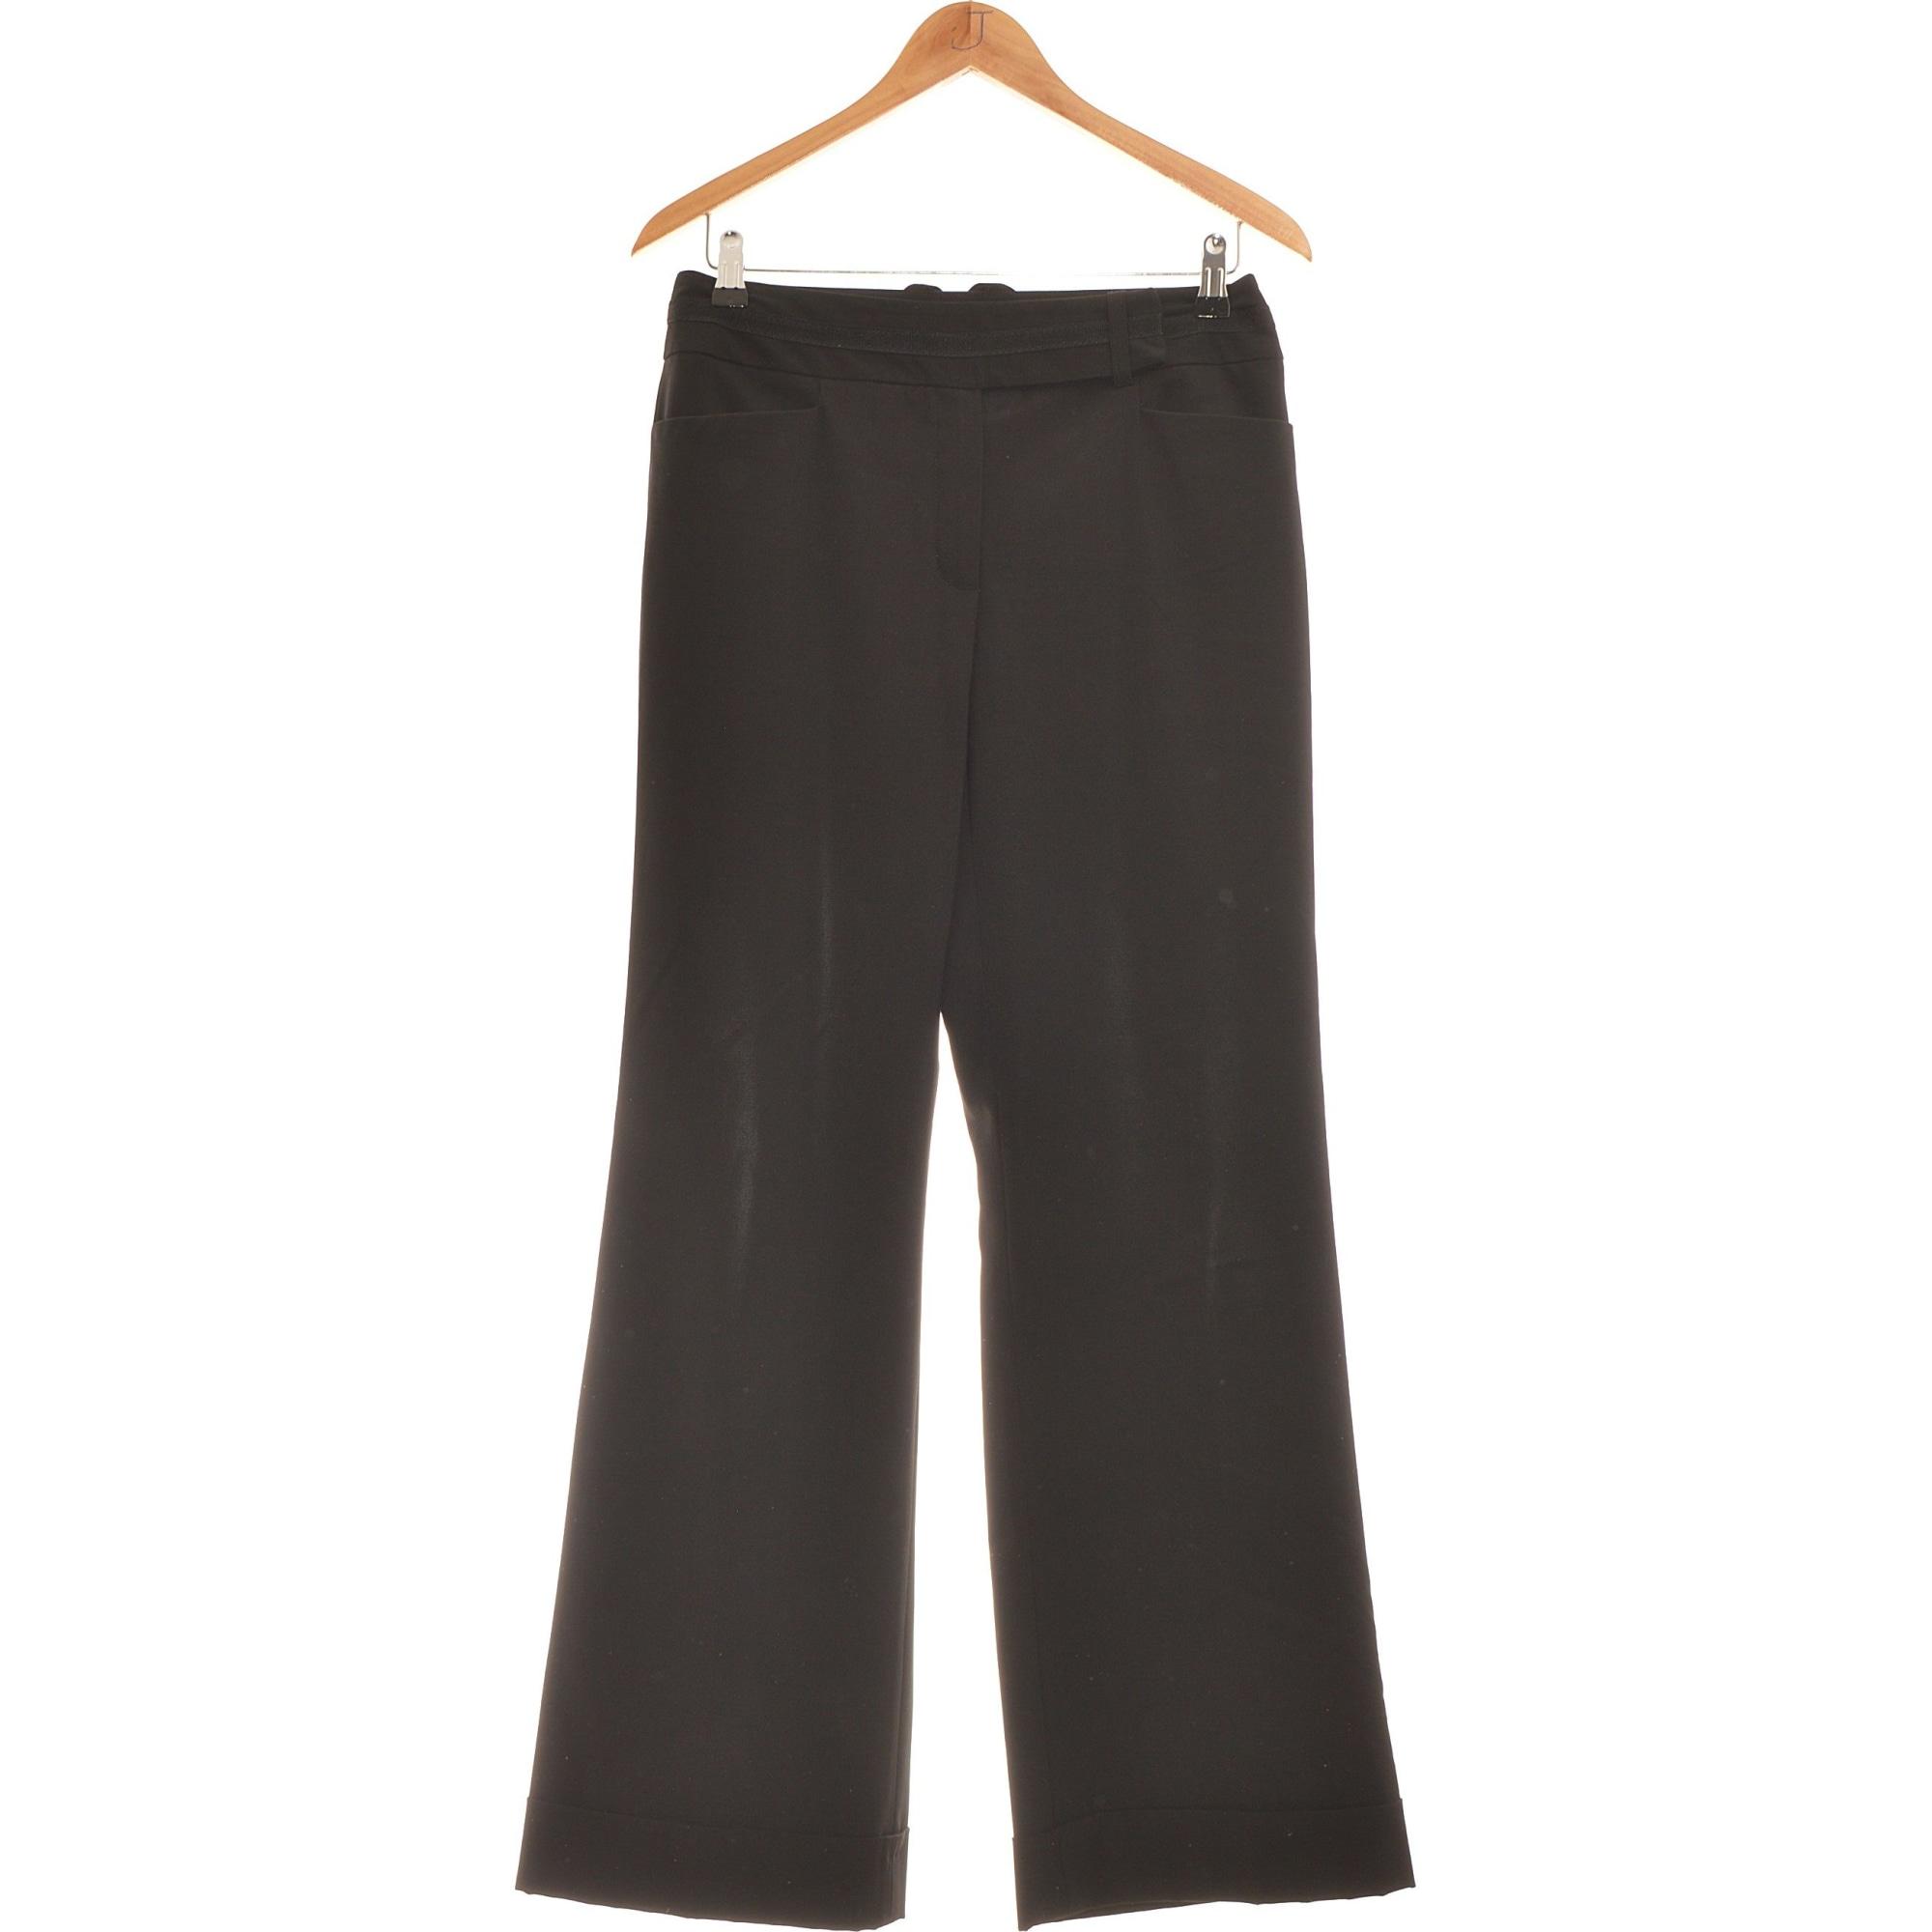 Cropped Pants, Capri Pants ALAIN MANOUKIAN Black